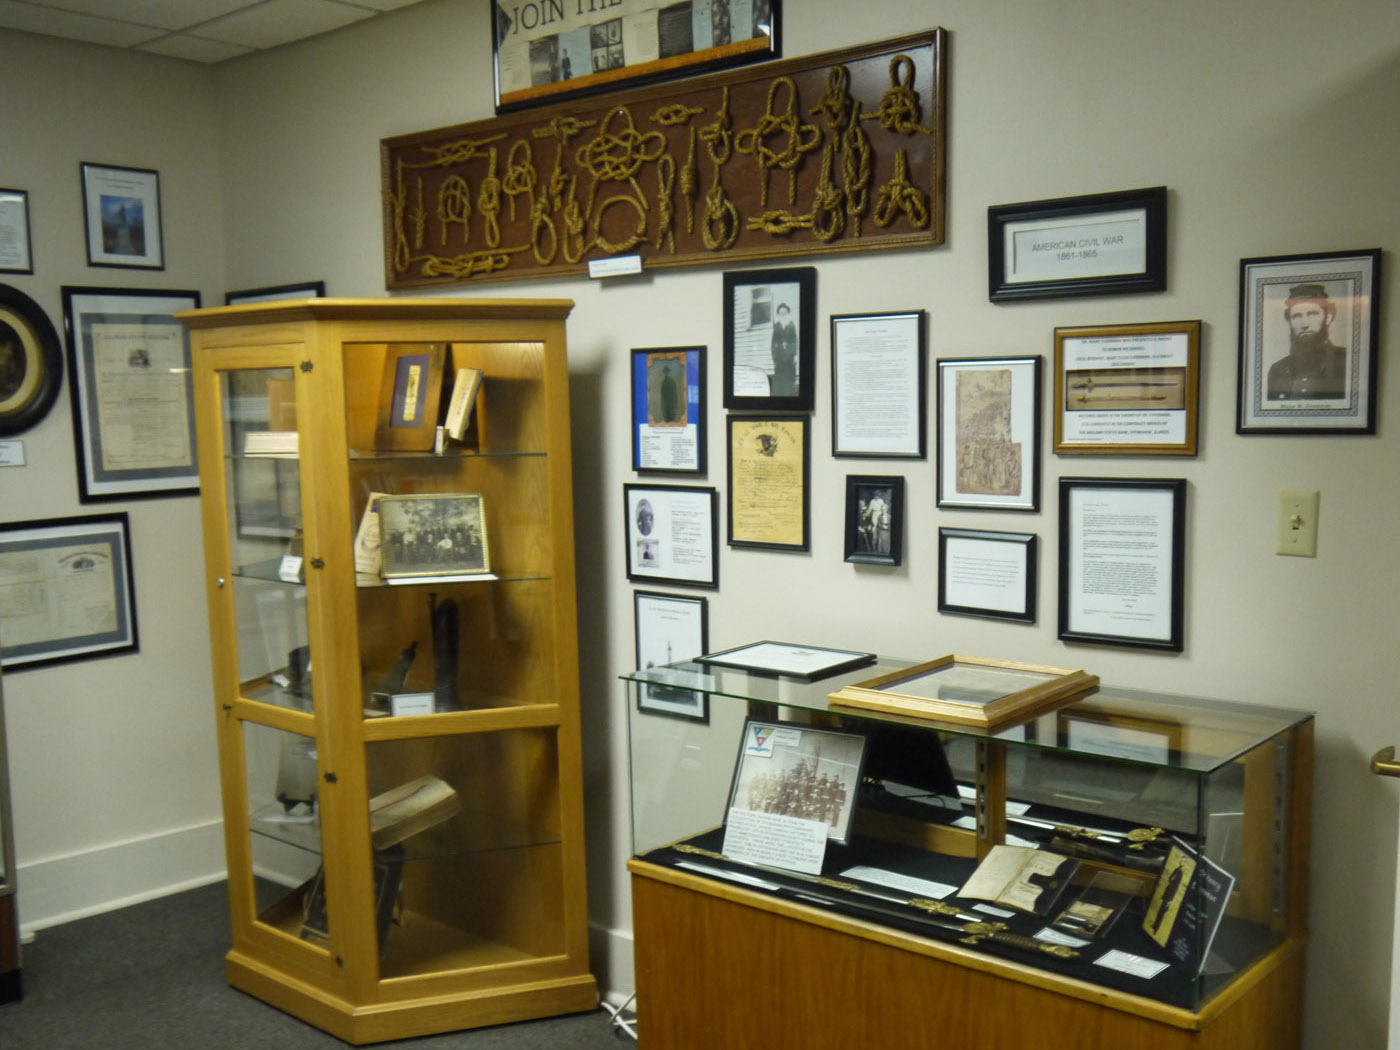 Civil War artifacts and photographs